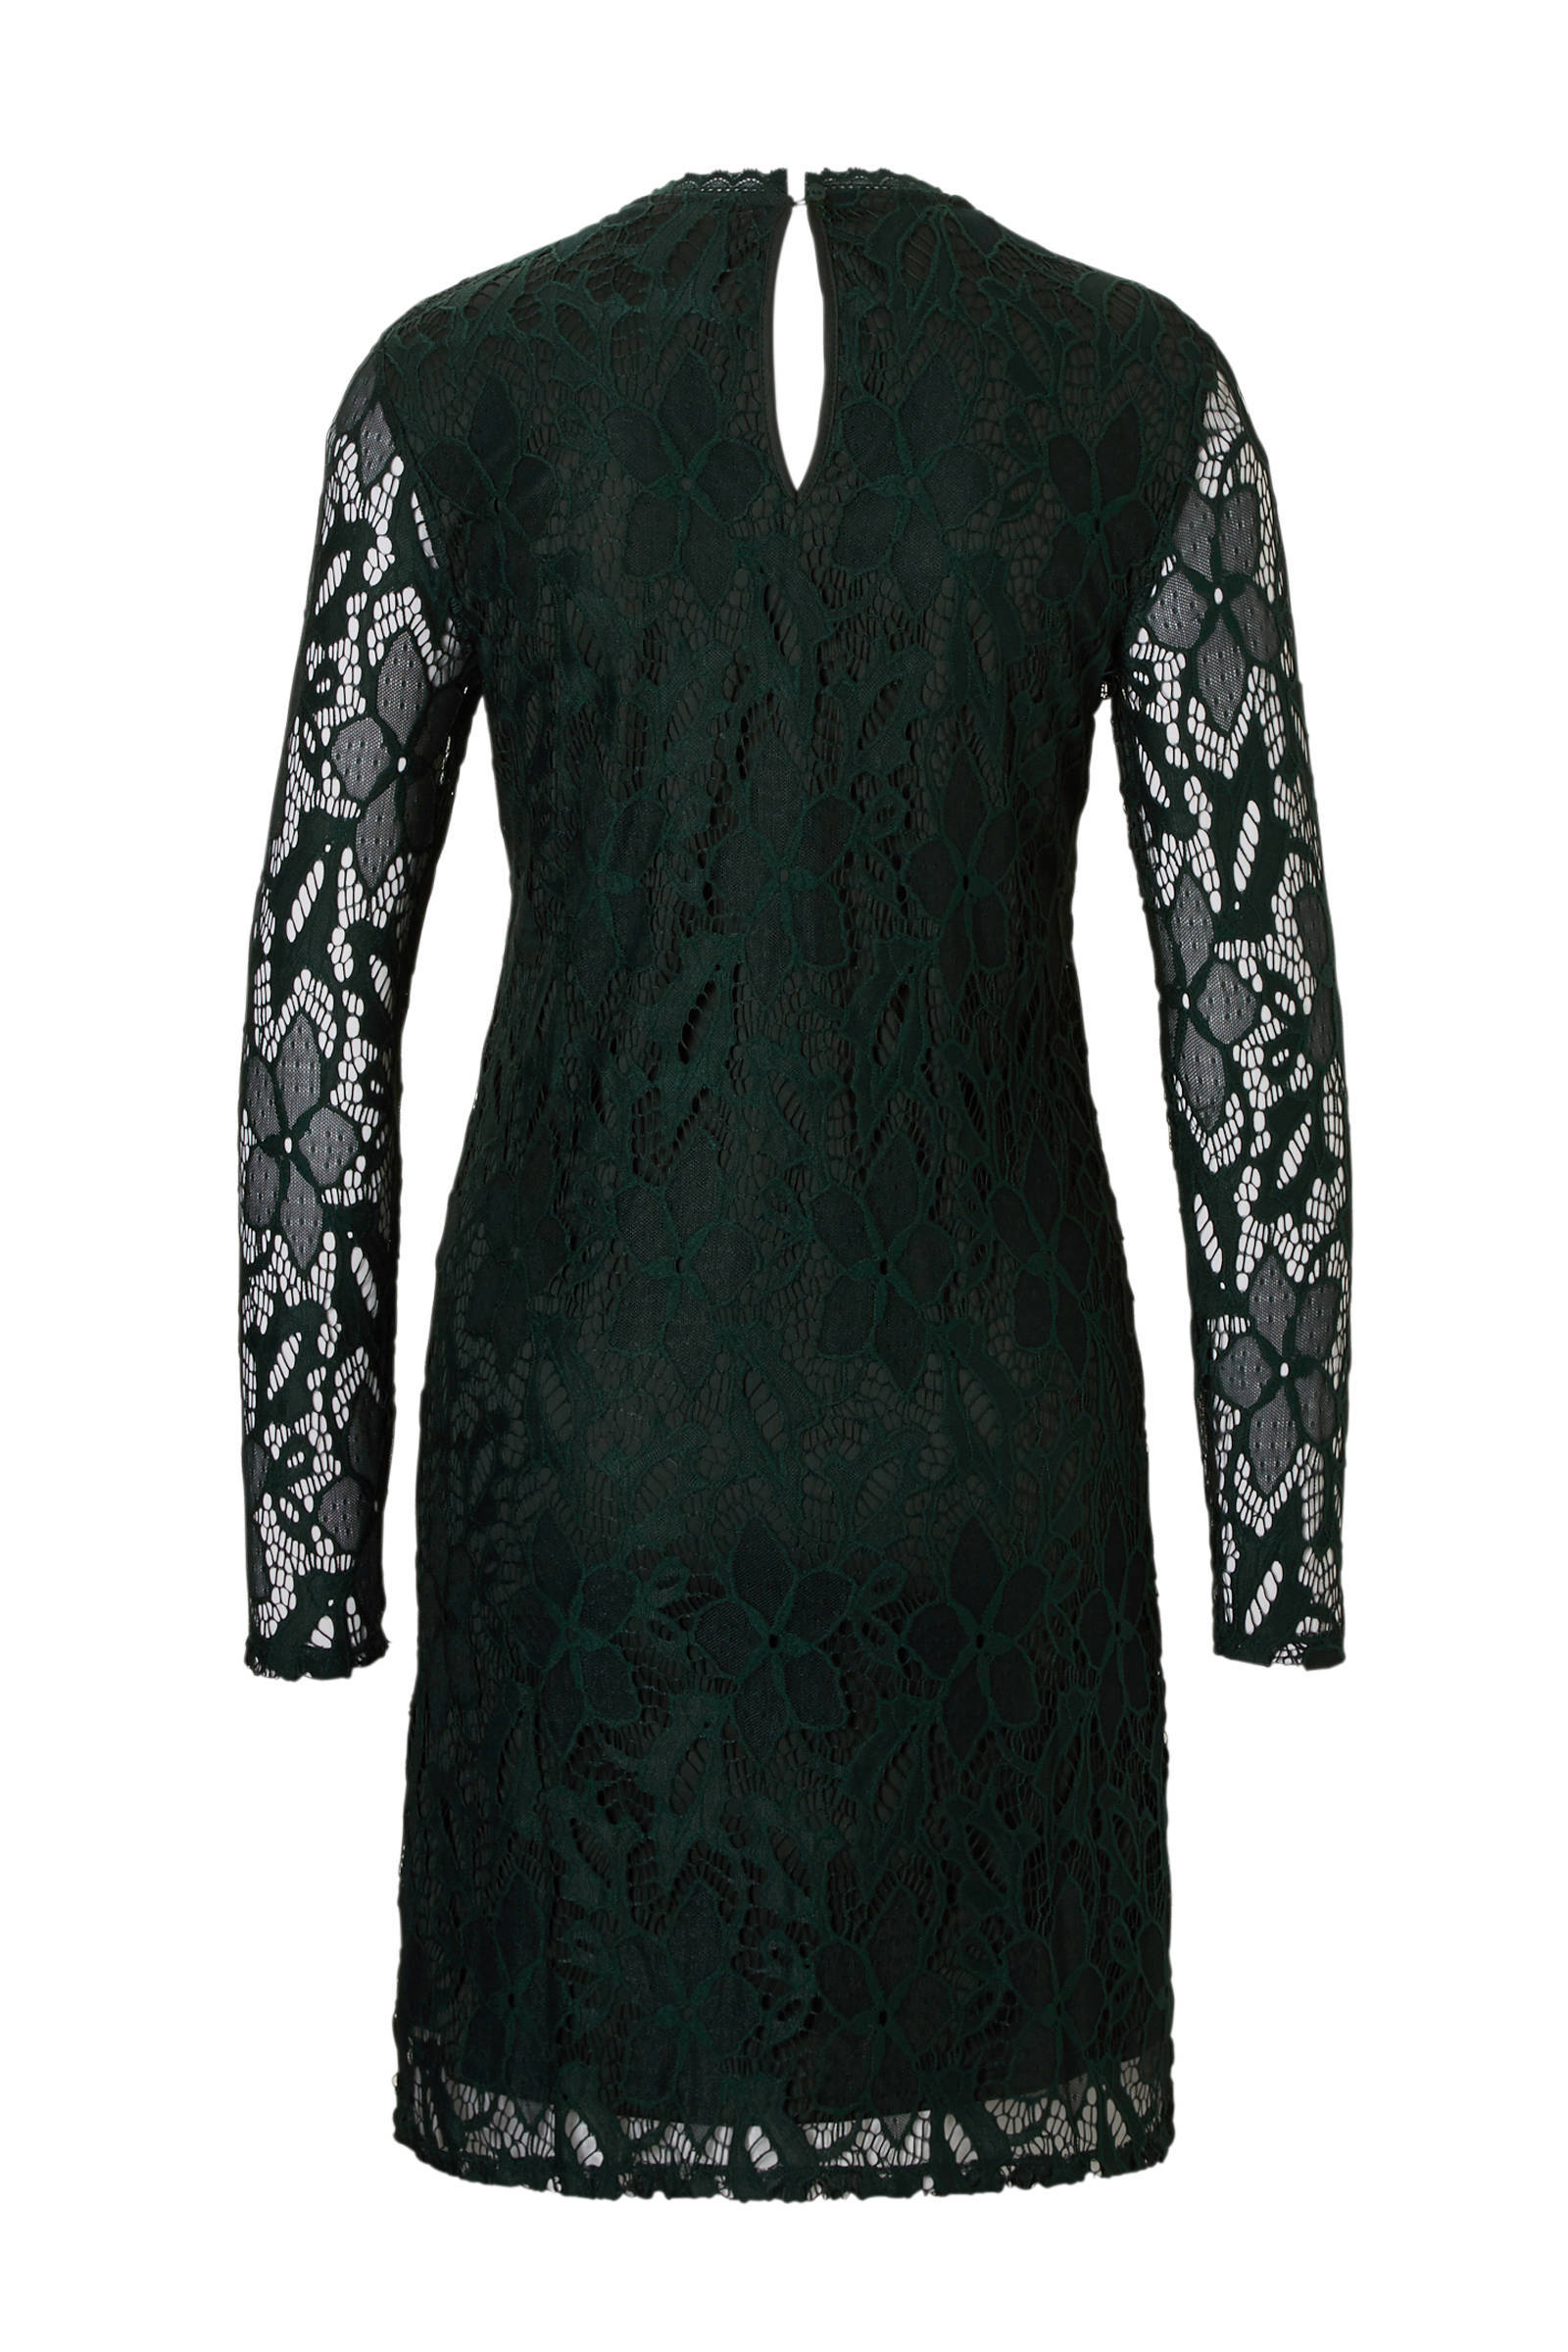 VILA met VILA jurk jurk kant 50wqB8n4x